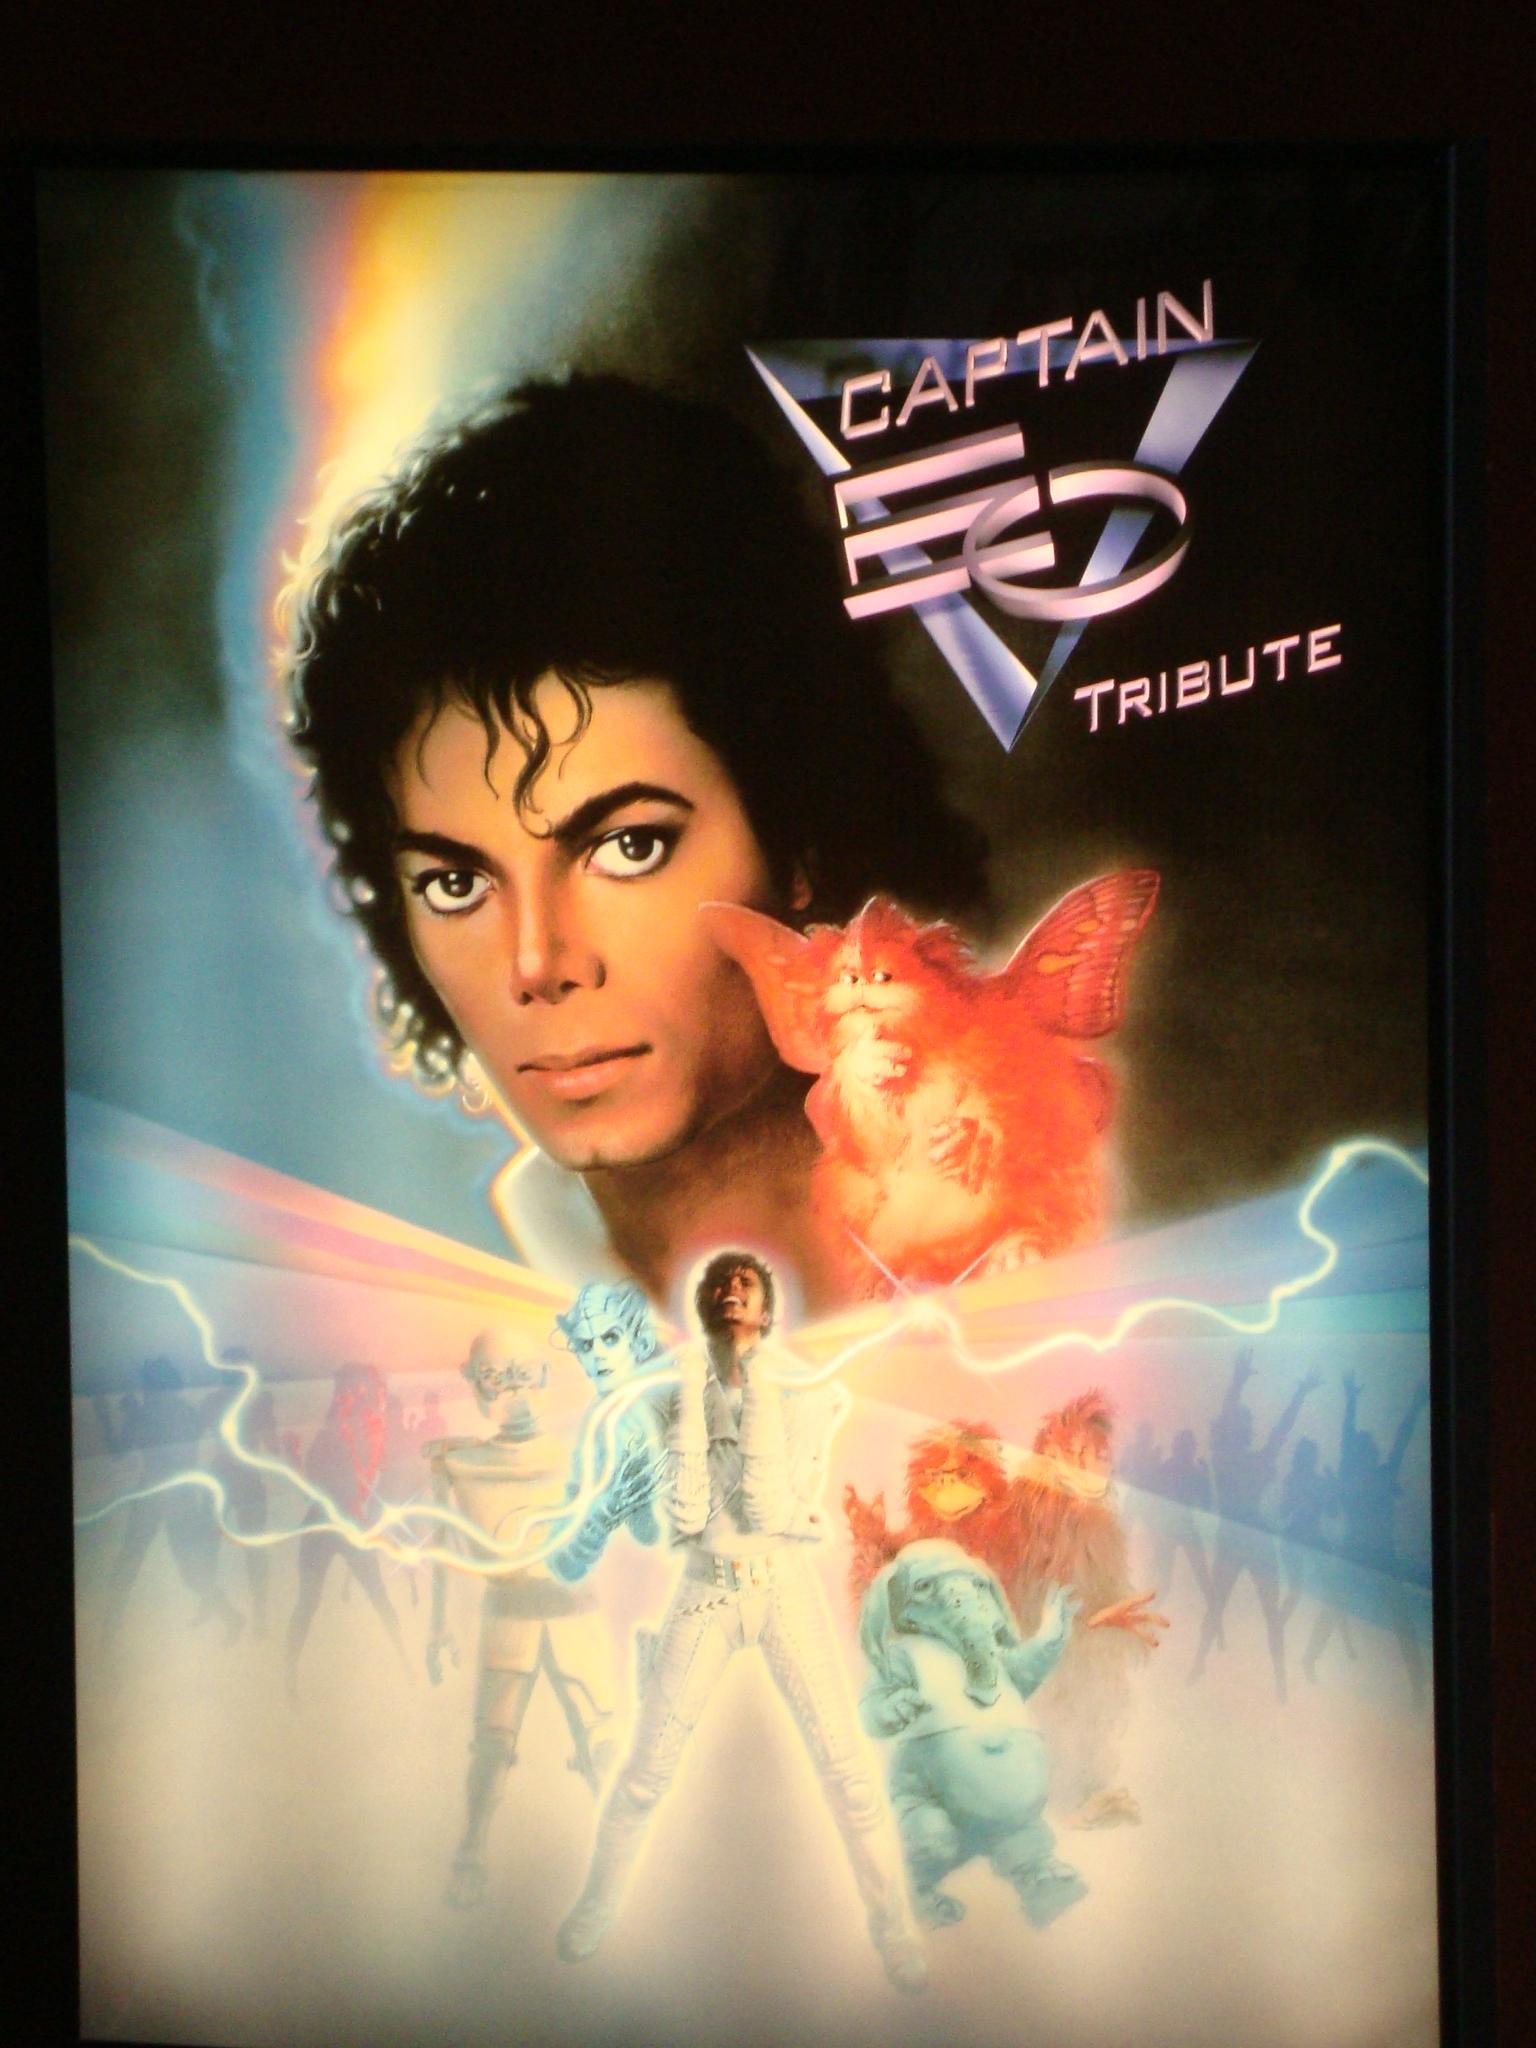 New Captain Eo Poster Michael Jackson Drfunkenberry.com Exclusive!